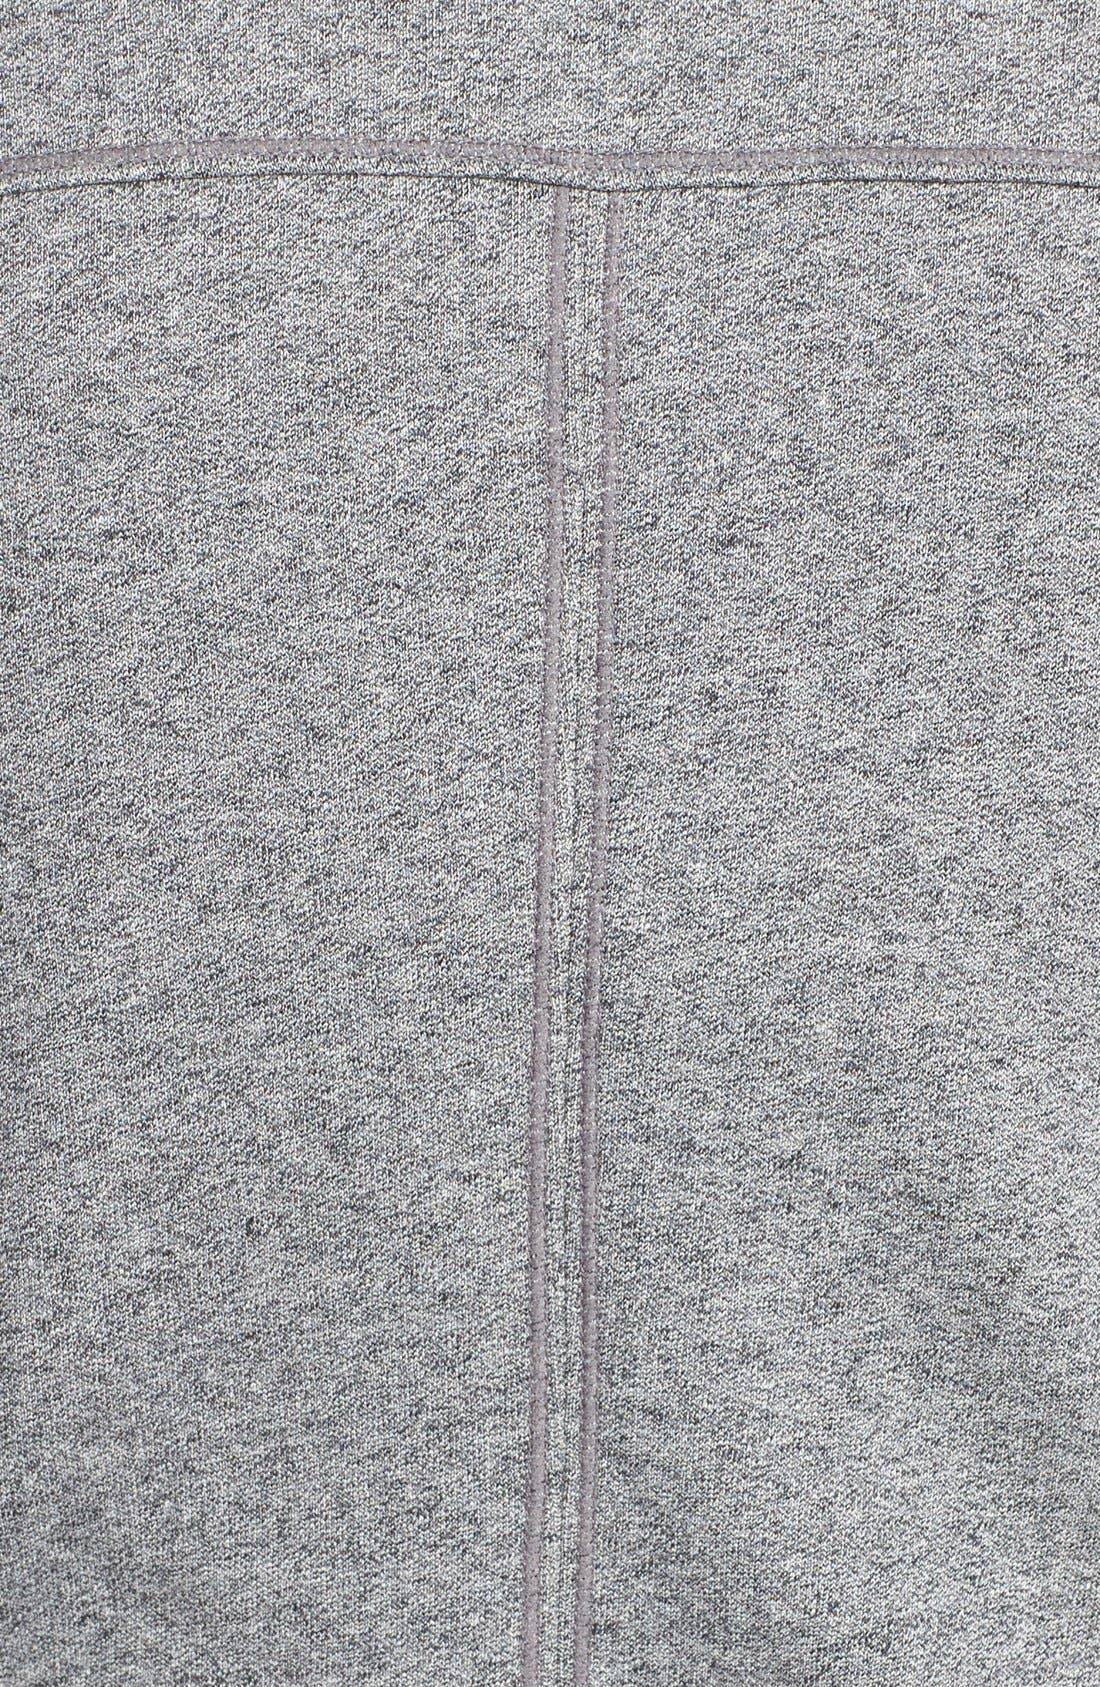 Into Balance Jacket,                             Alternate thumbnail 5, color,                             Grey Blizzard Heather